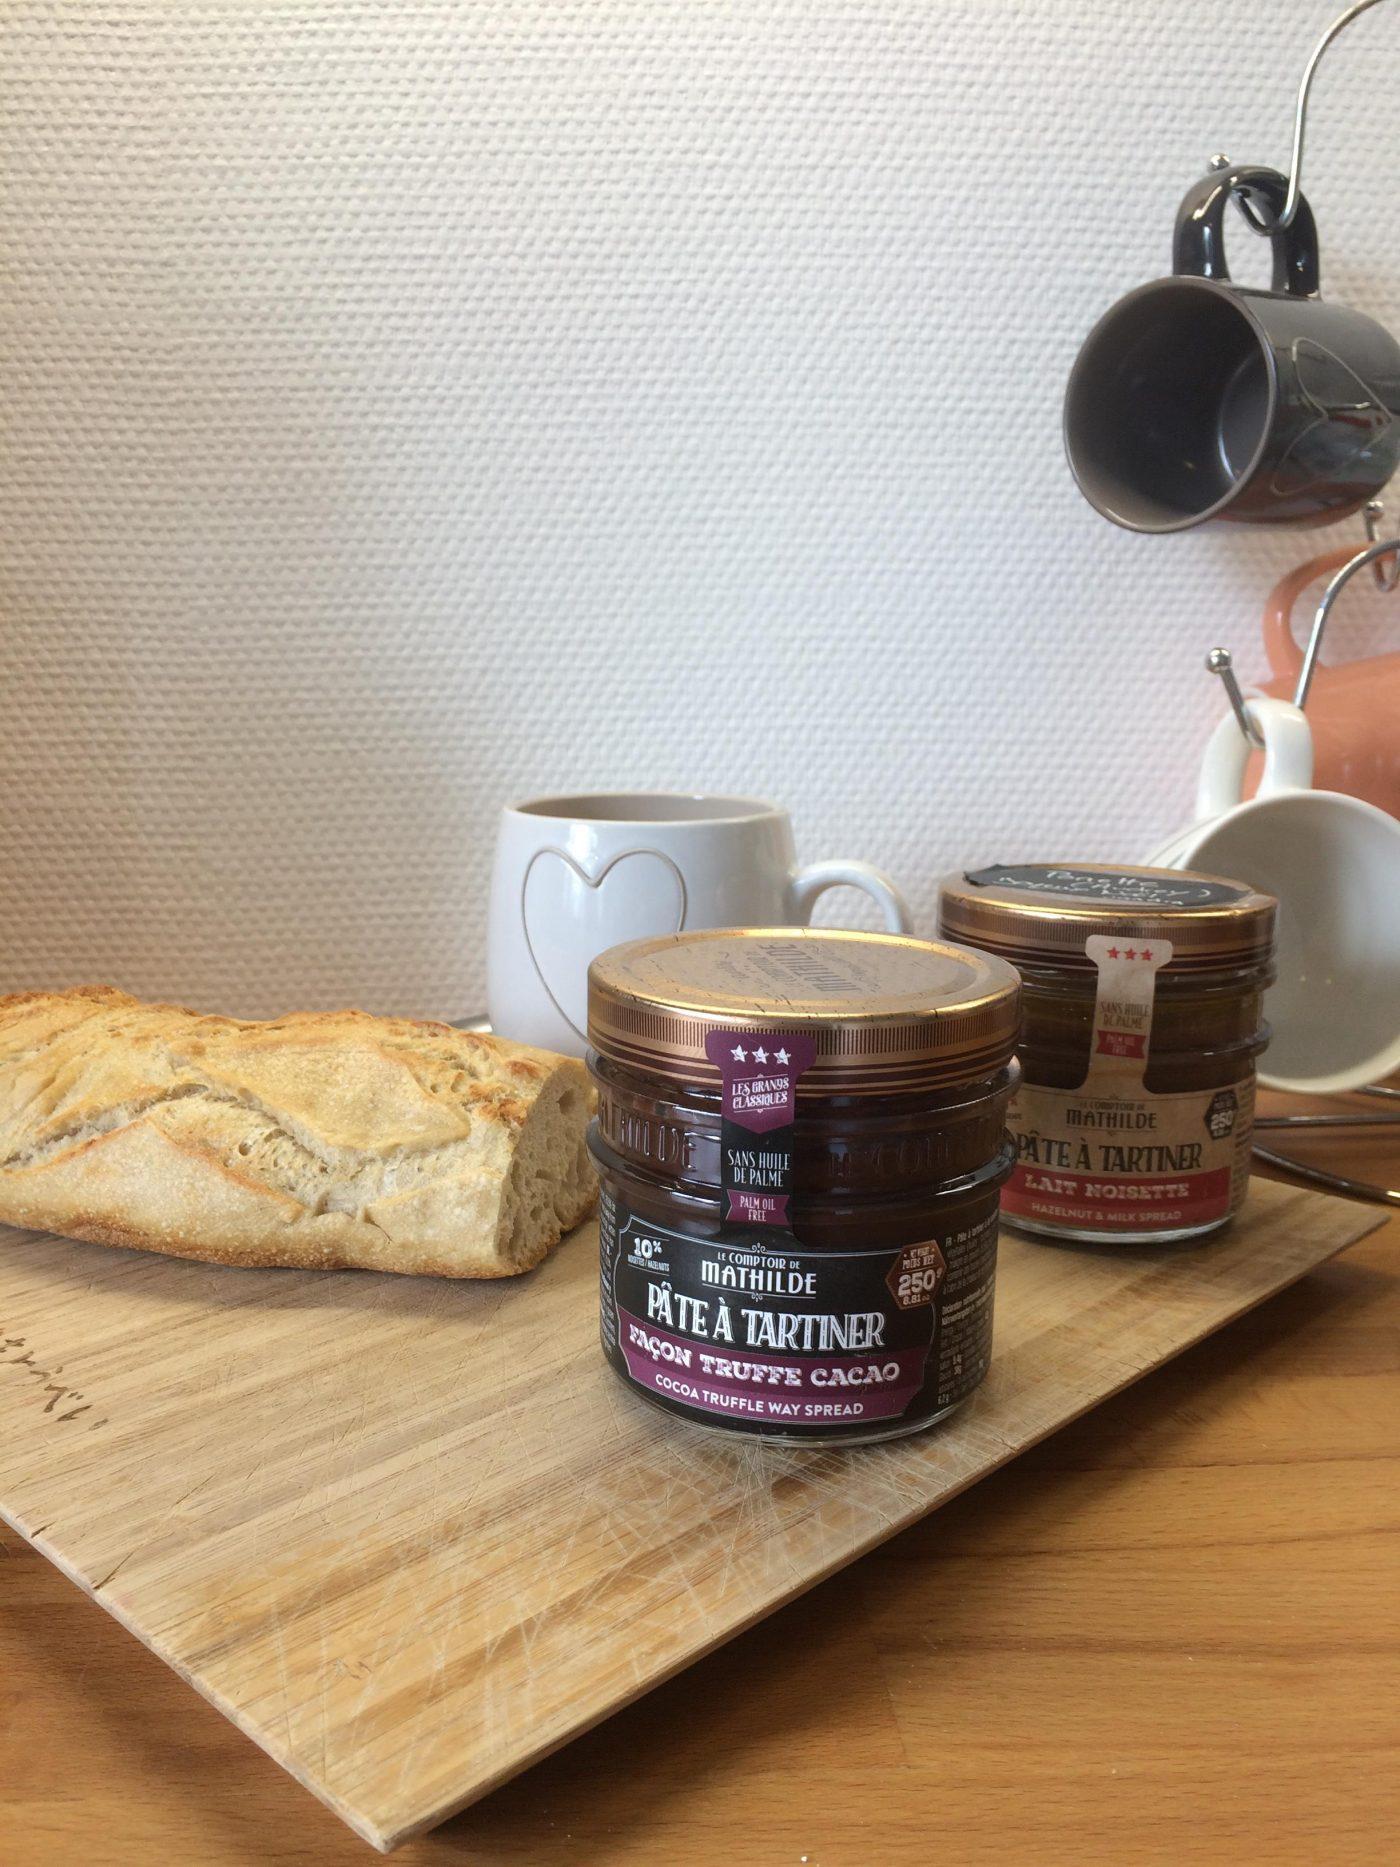 La Pâte à Tartiner du Comptoir de Mathilde